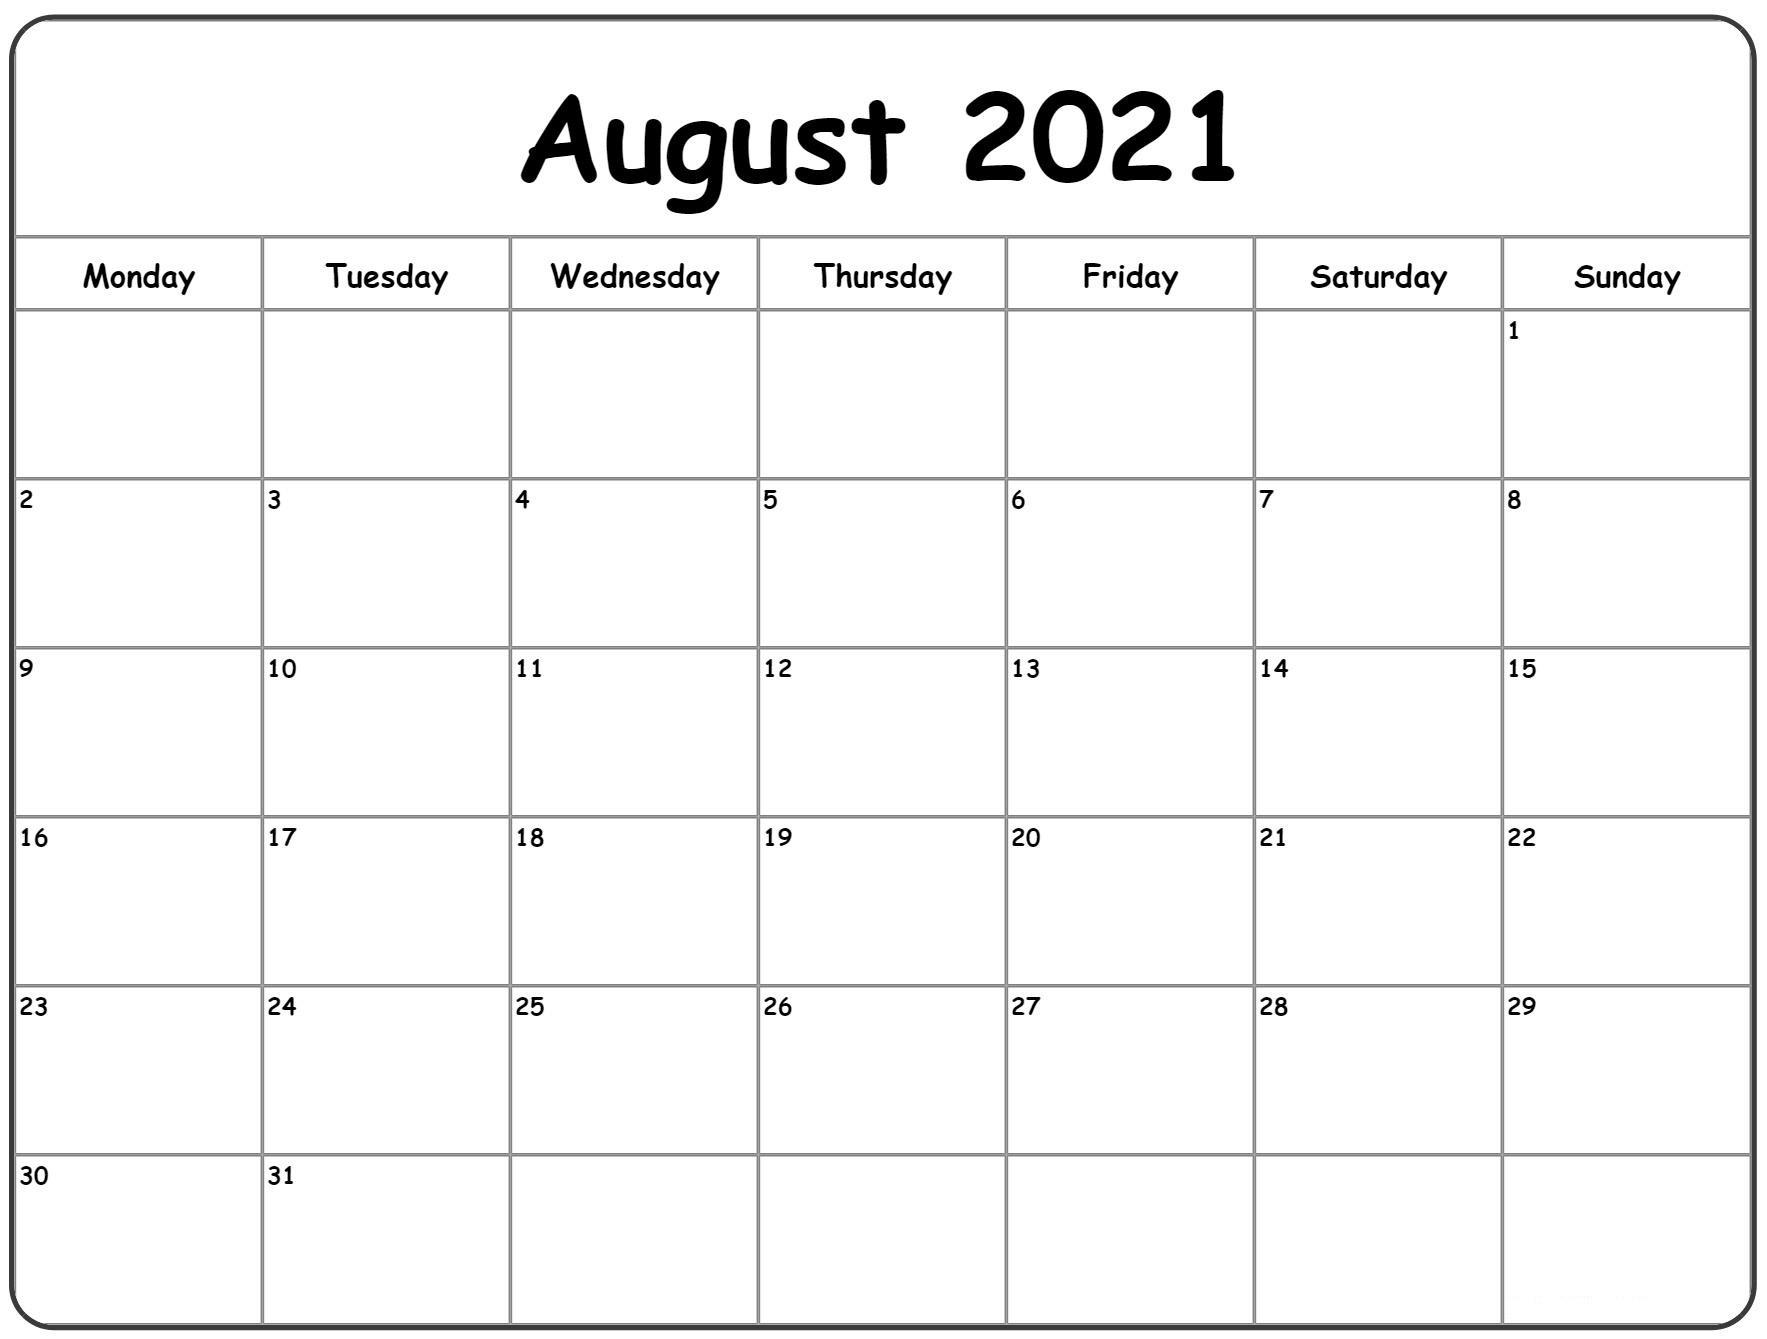 Catch August 2021 Calendar To Fill In